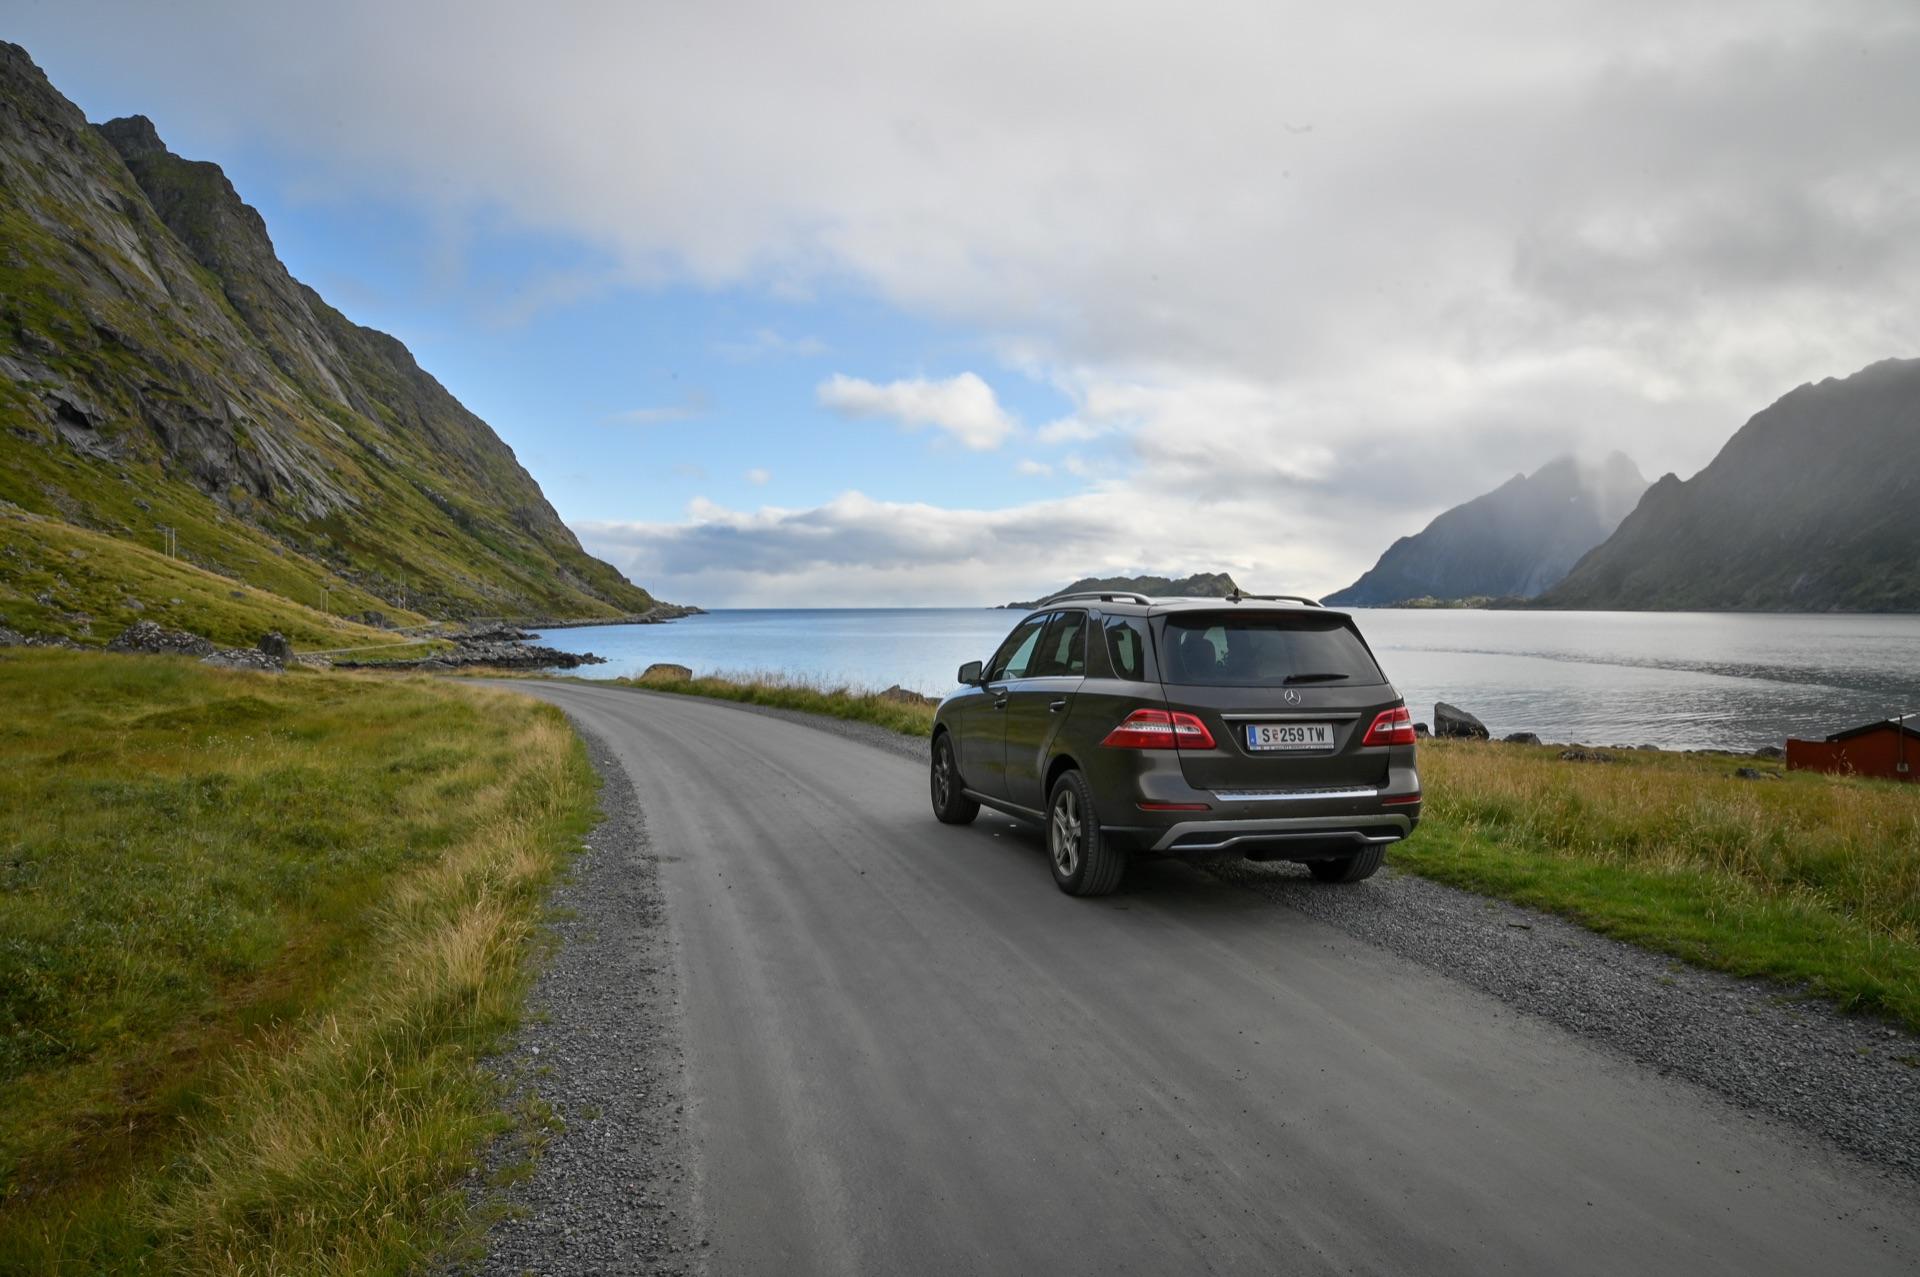 Flakstadoy, Lofoten Islands, Norway, Travel Drift